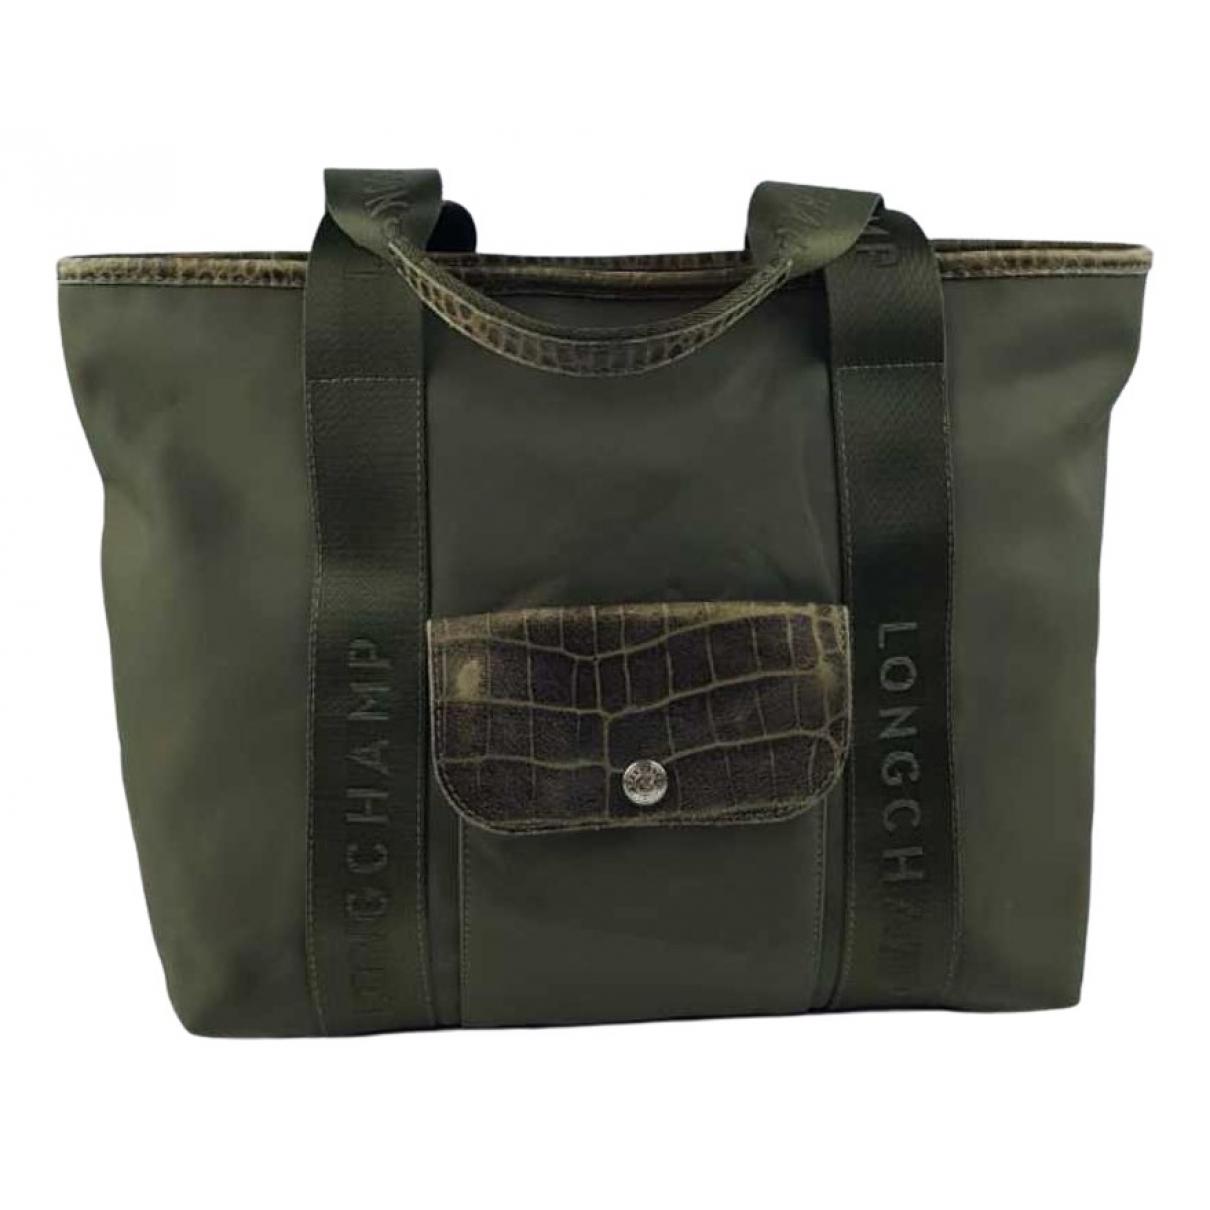 Longchamp \N Green Cloth handbag for Women \N